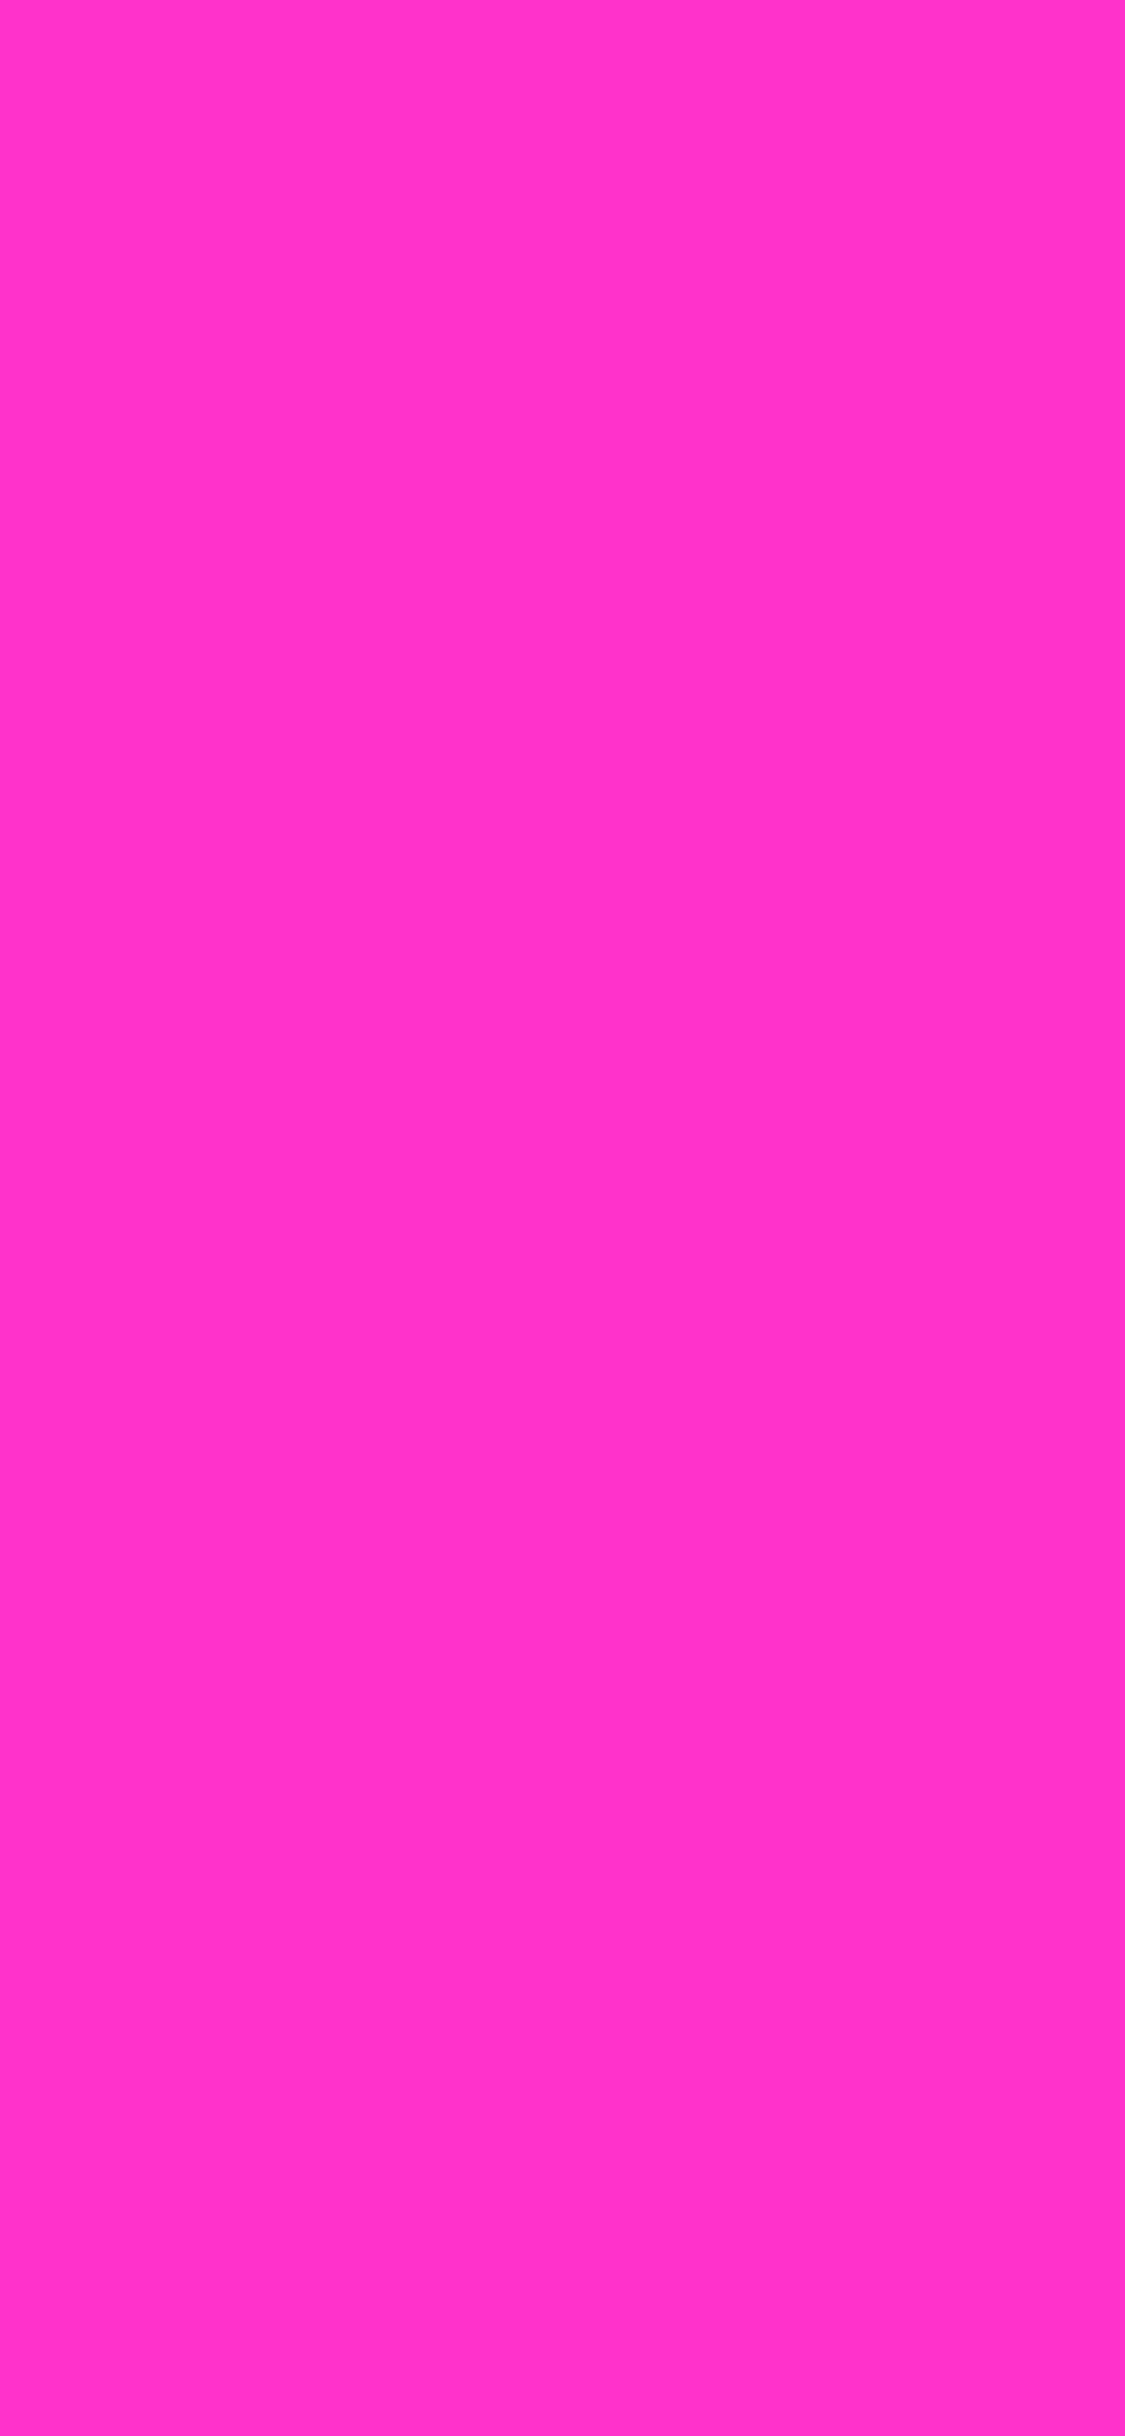 1125x2436 Razzle Dazzle Rose Solid Color Background